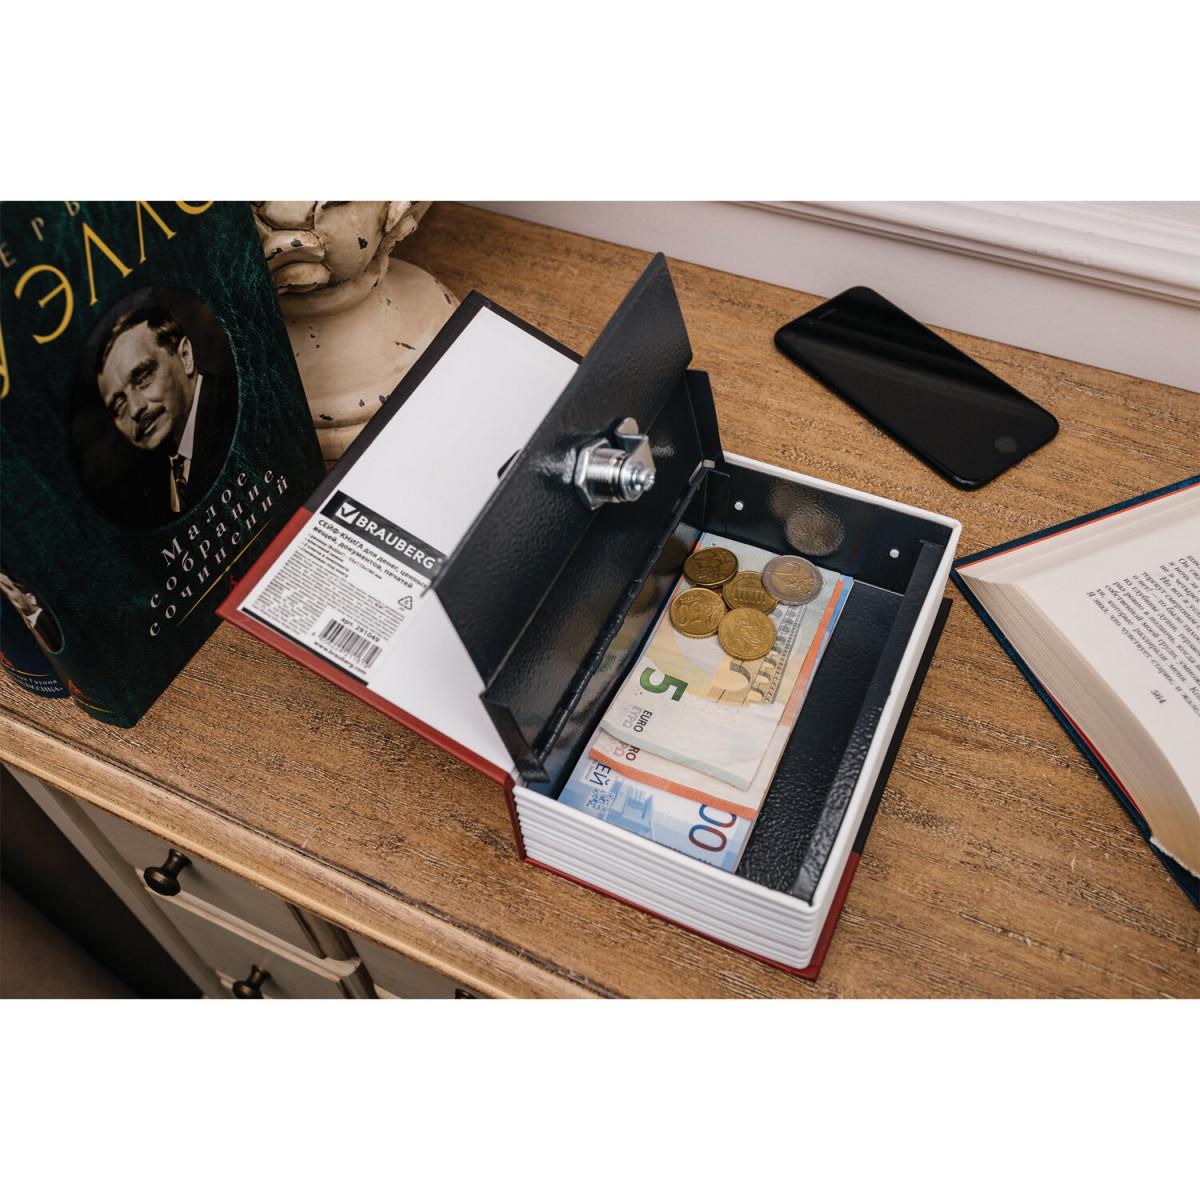 "Сейф-книга К. Маркс ""Капитал"", 55х115х180 мм, ключевой замок, BRAUBERG, 291049 (арт. 291049)"